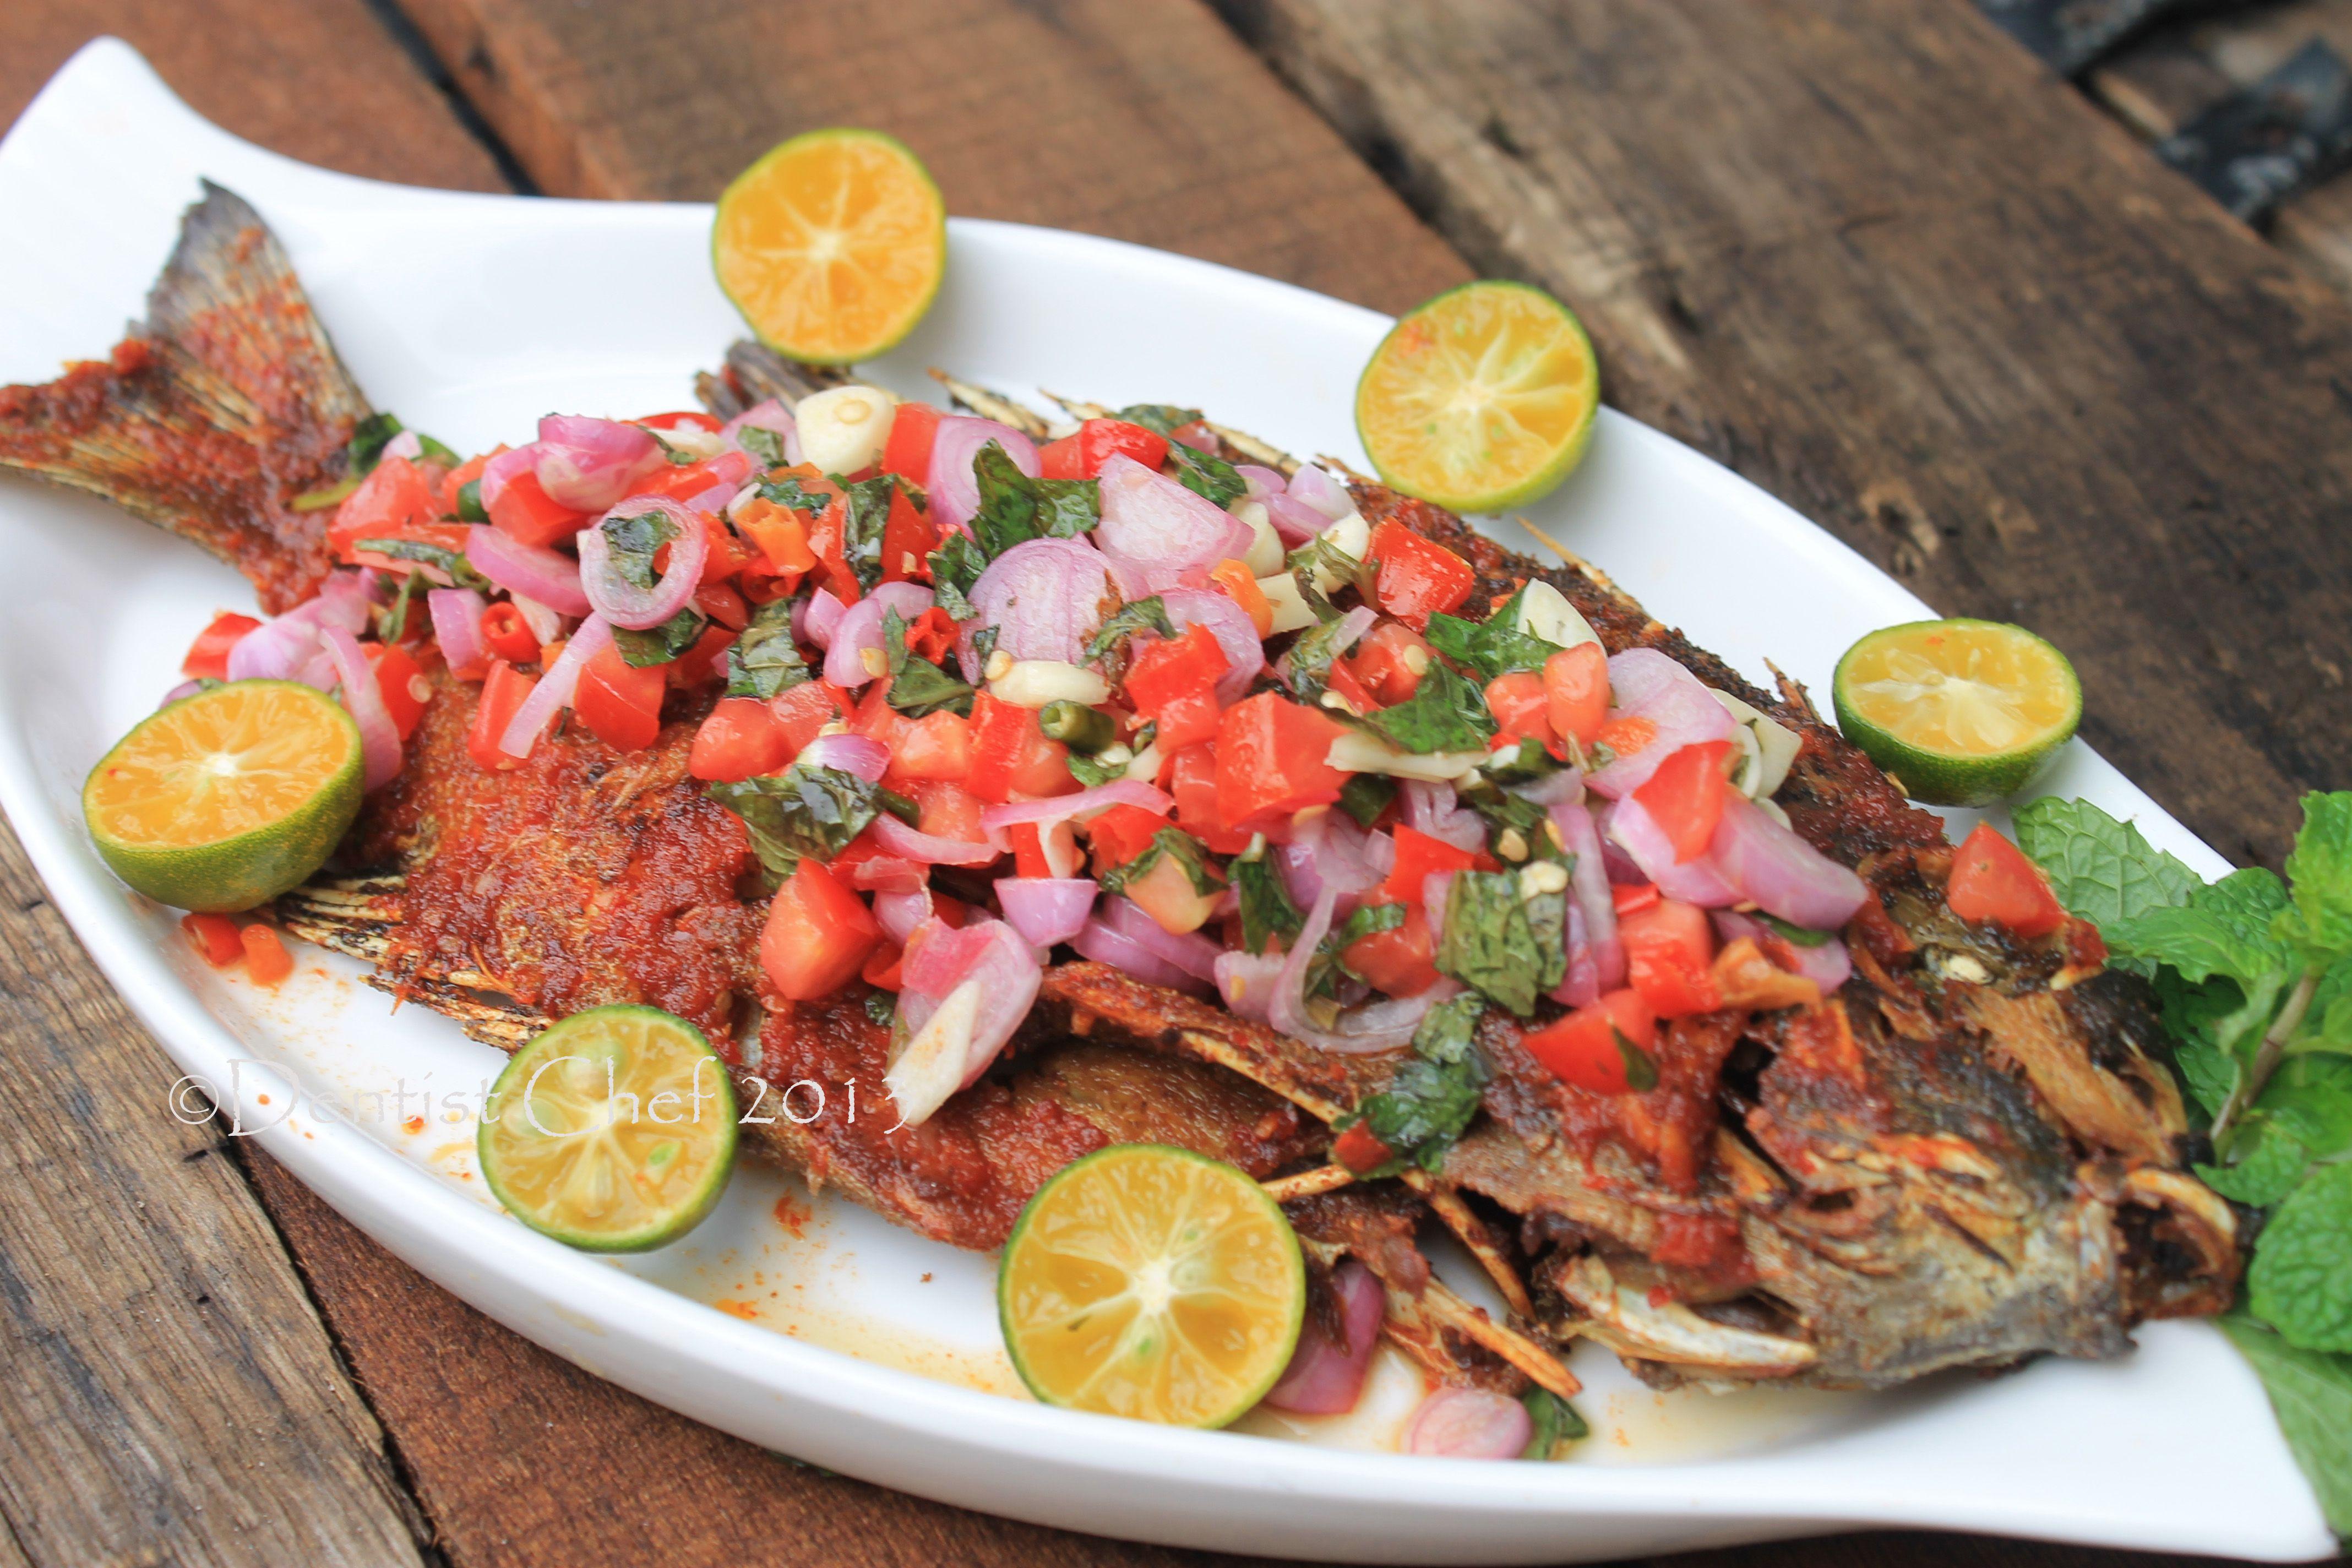 Ikan Baronang Bakar Bumbu Rica Rica Sambal Dabu Dabu Grilled Rabbit Fish With Spicy Rica Rica Dabu Dabu Salsa Masakan Resep Ikan Resep Ikan Bakar